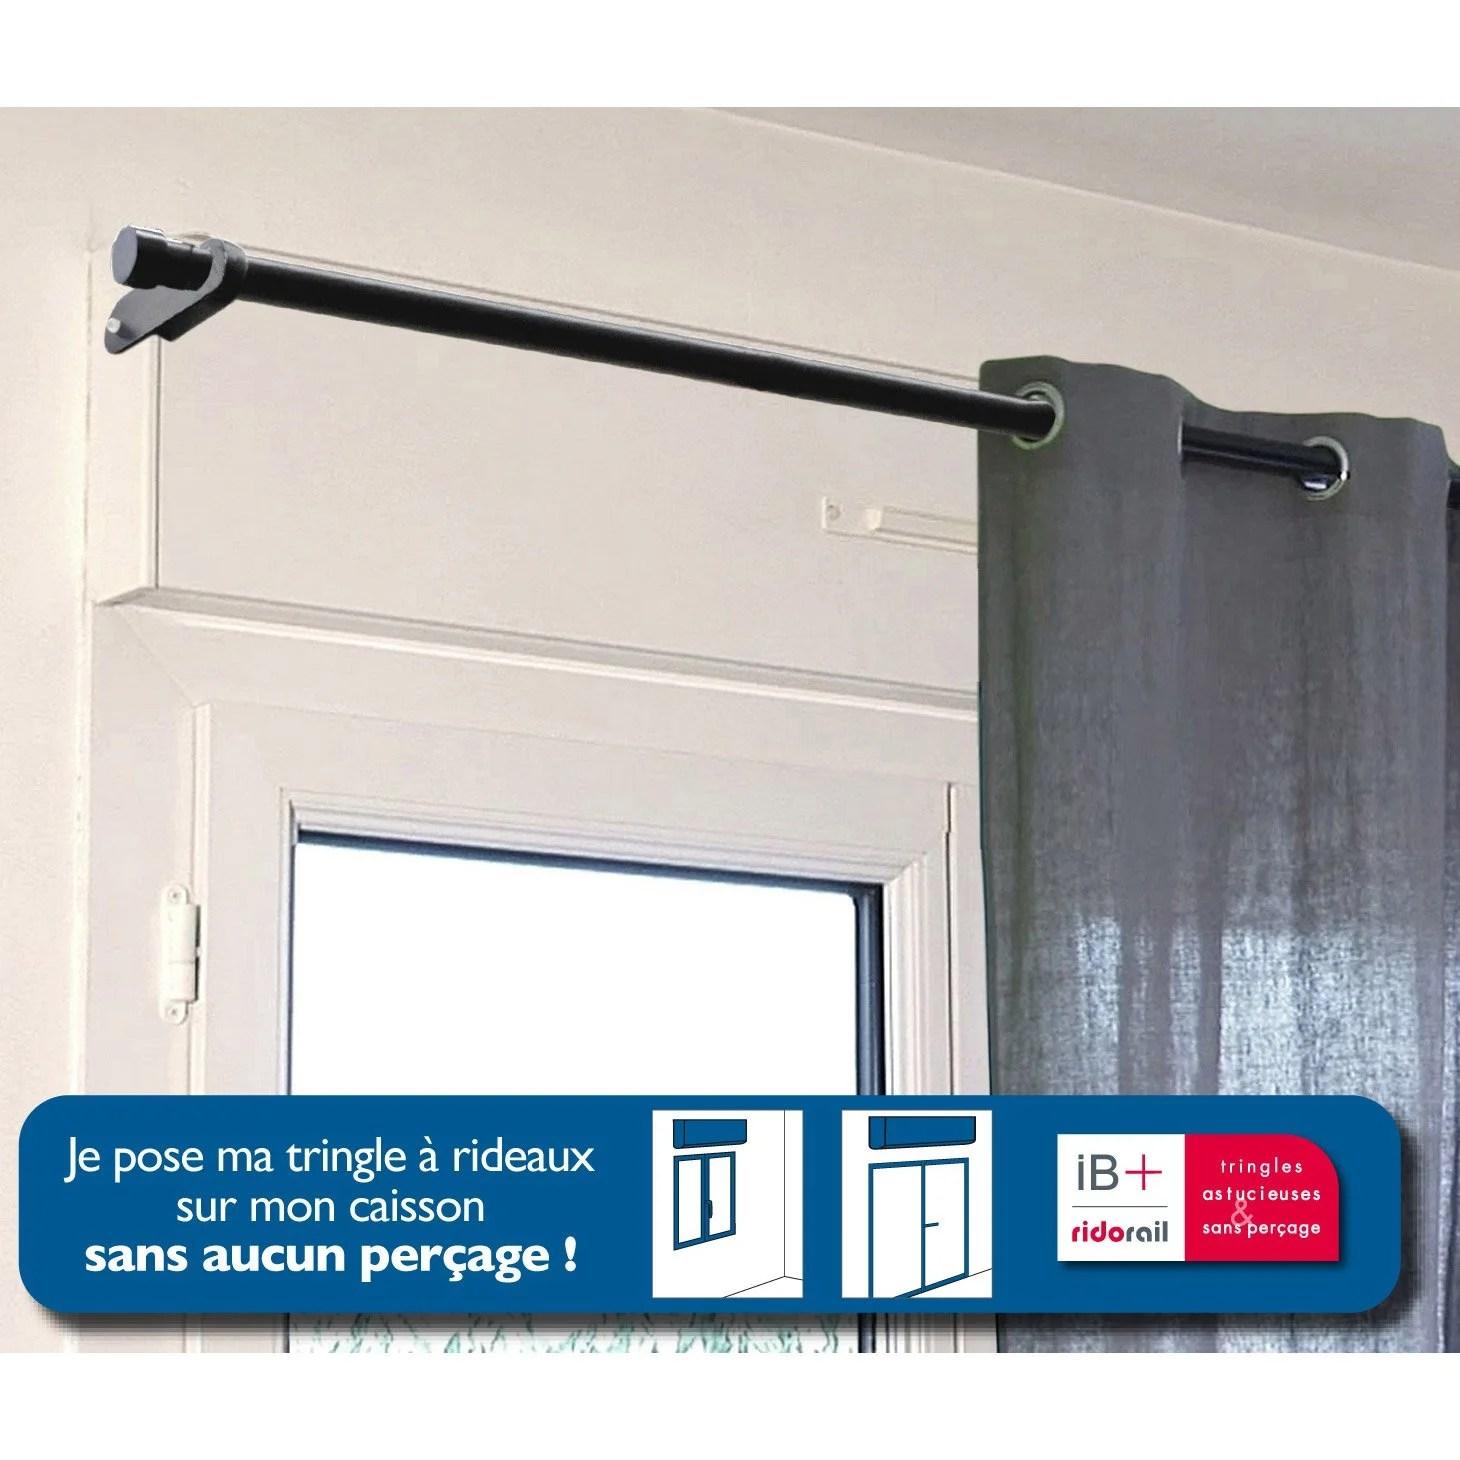 Stunning Support Sans Perage Tringle Rideau Ib Mm Noir Mat